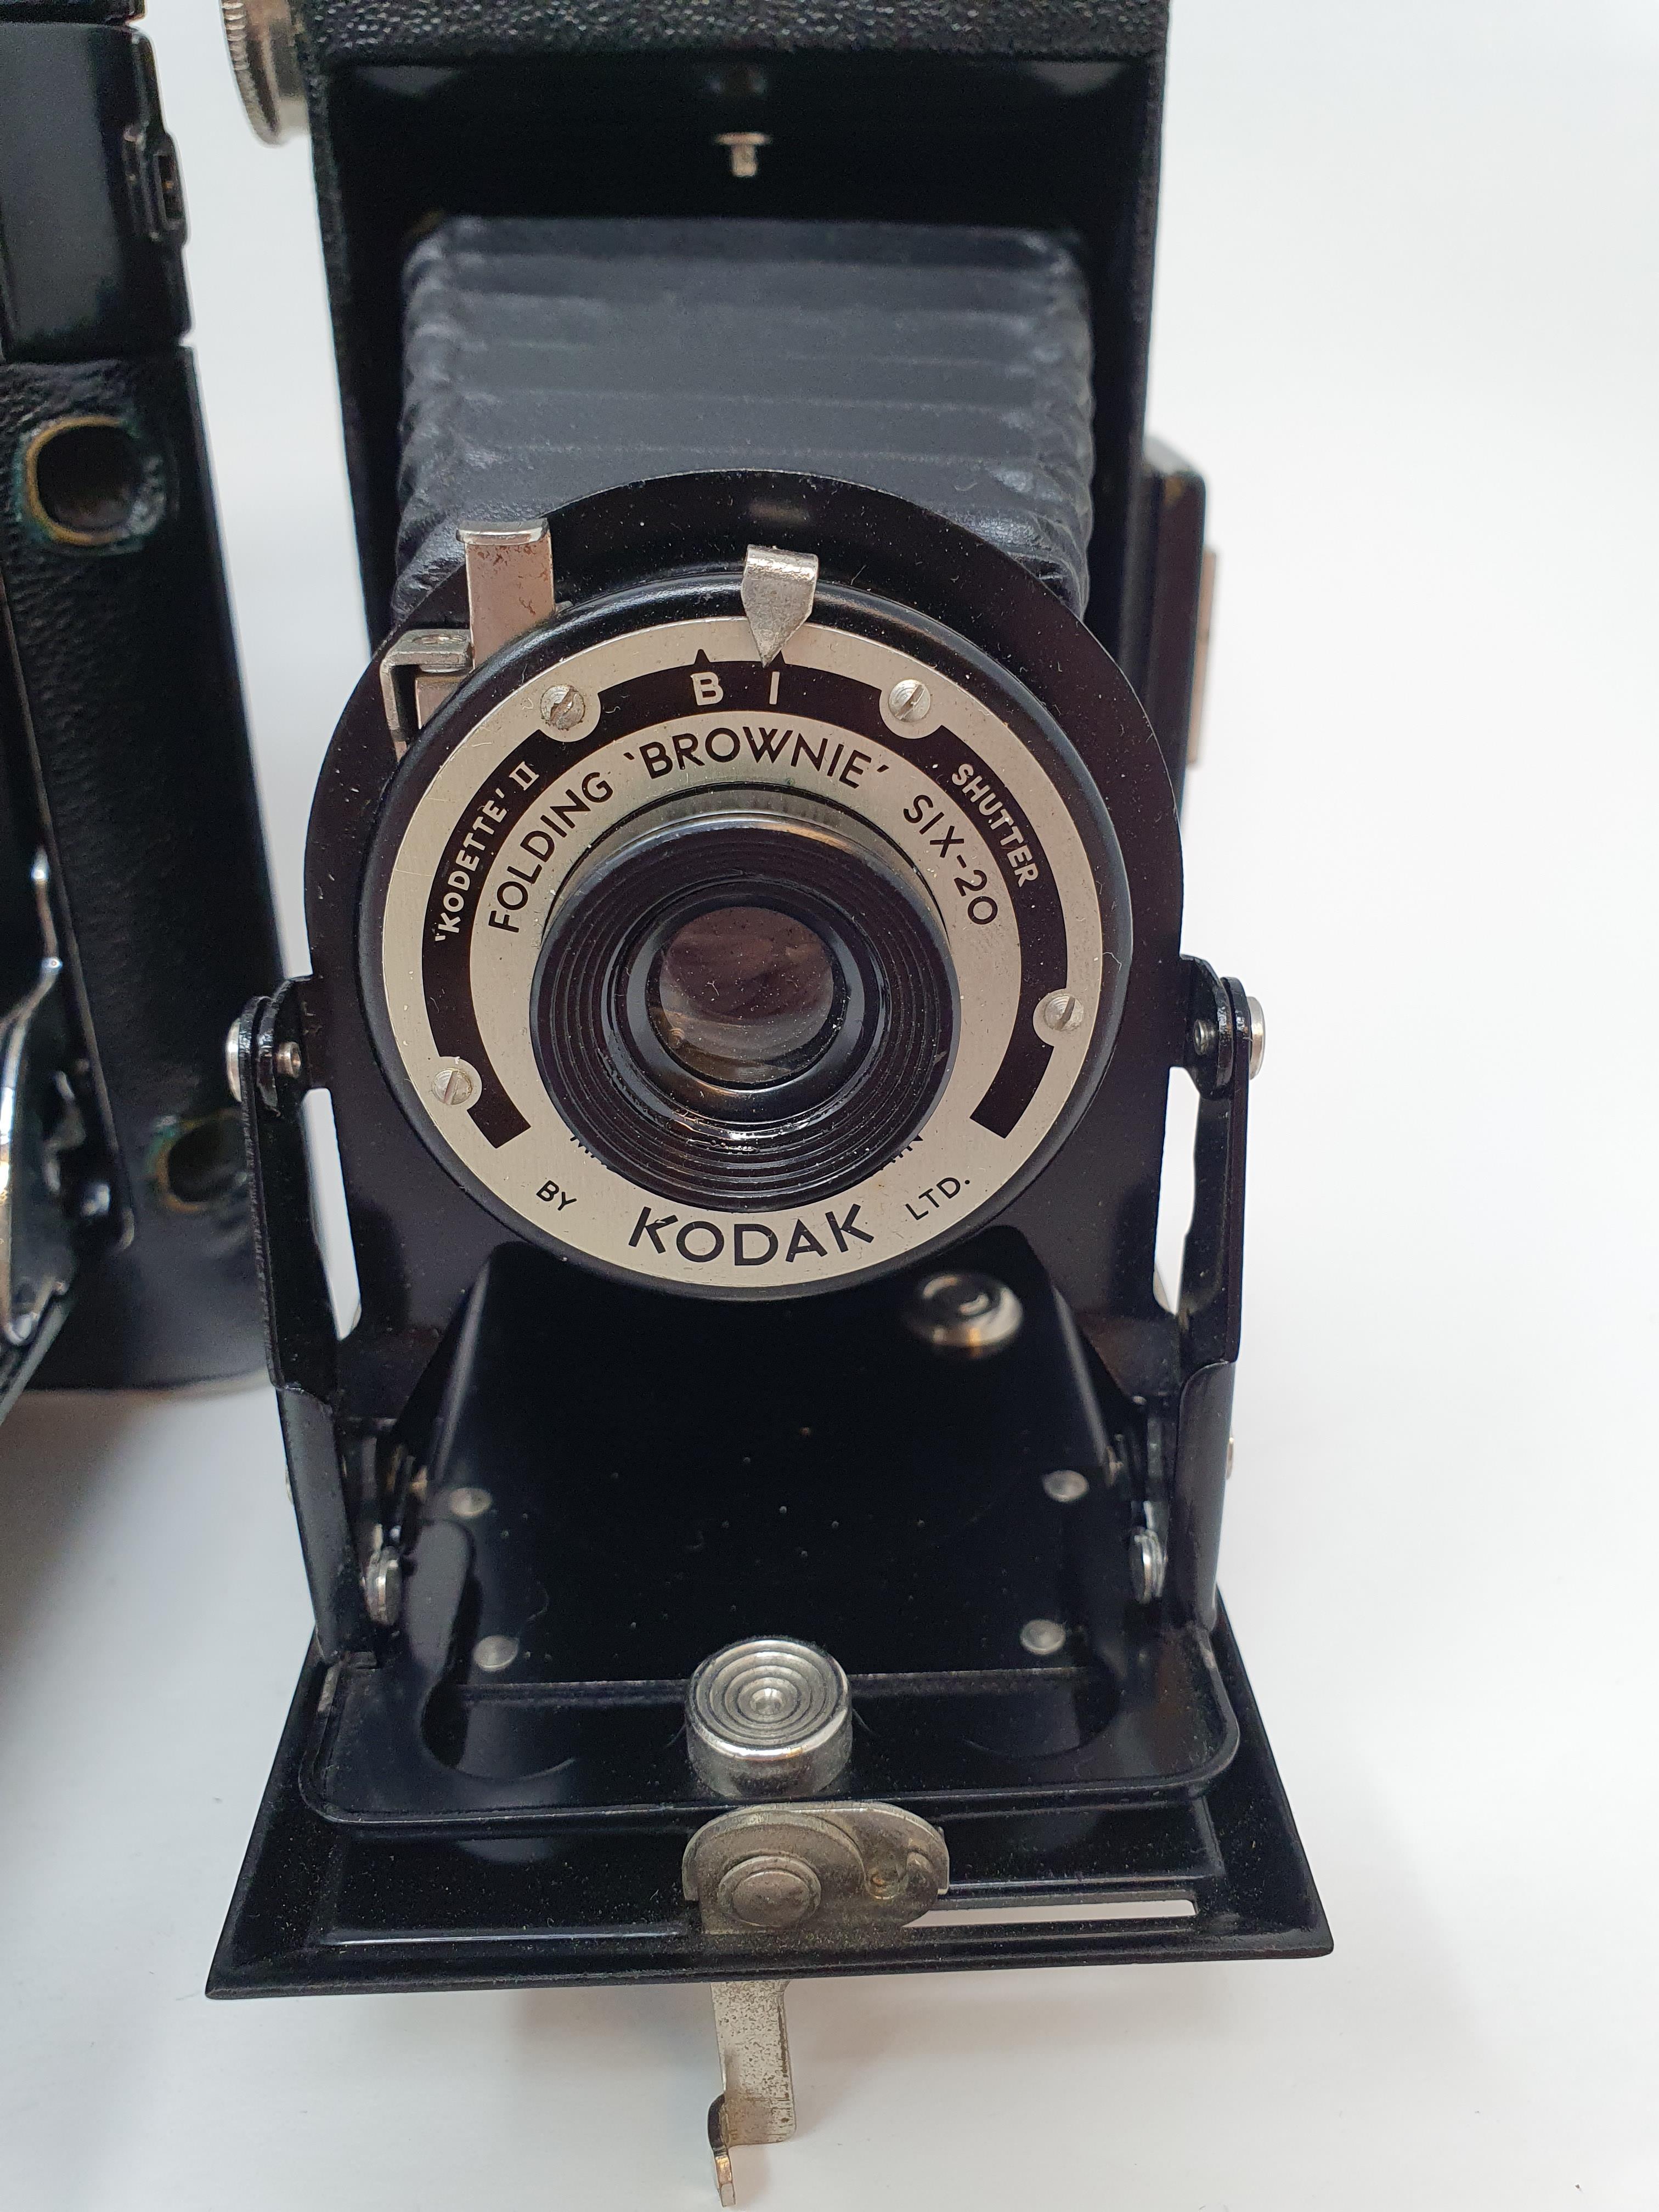 A Kodak Regent folding camera, with leather outer case, a Kodak folding camera, with leather outer - Image 4 of 6